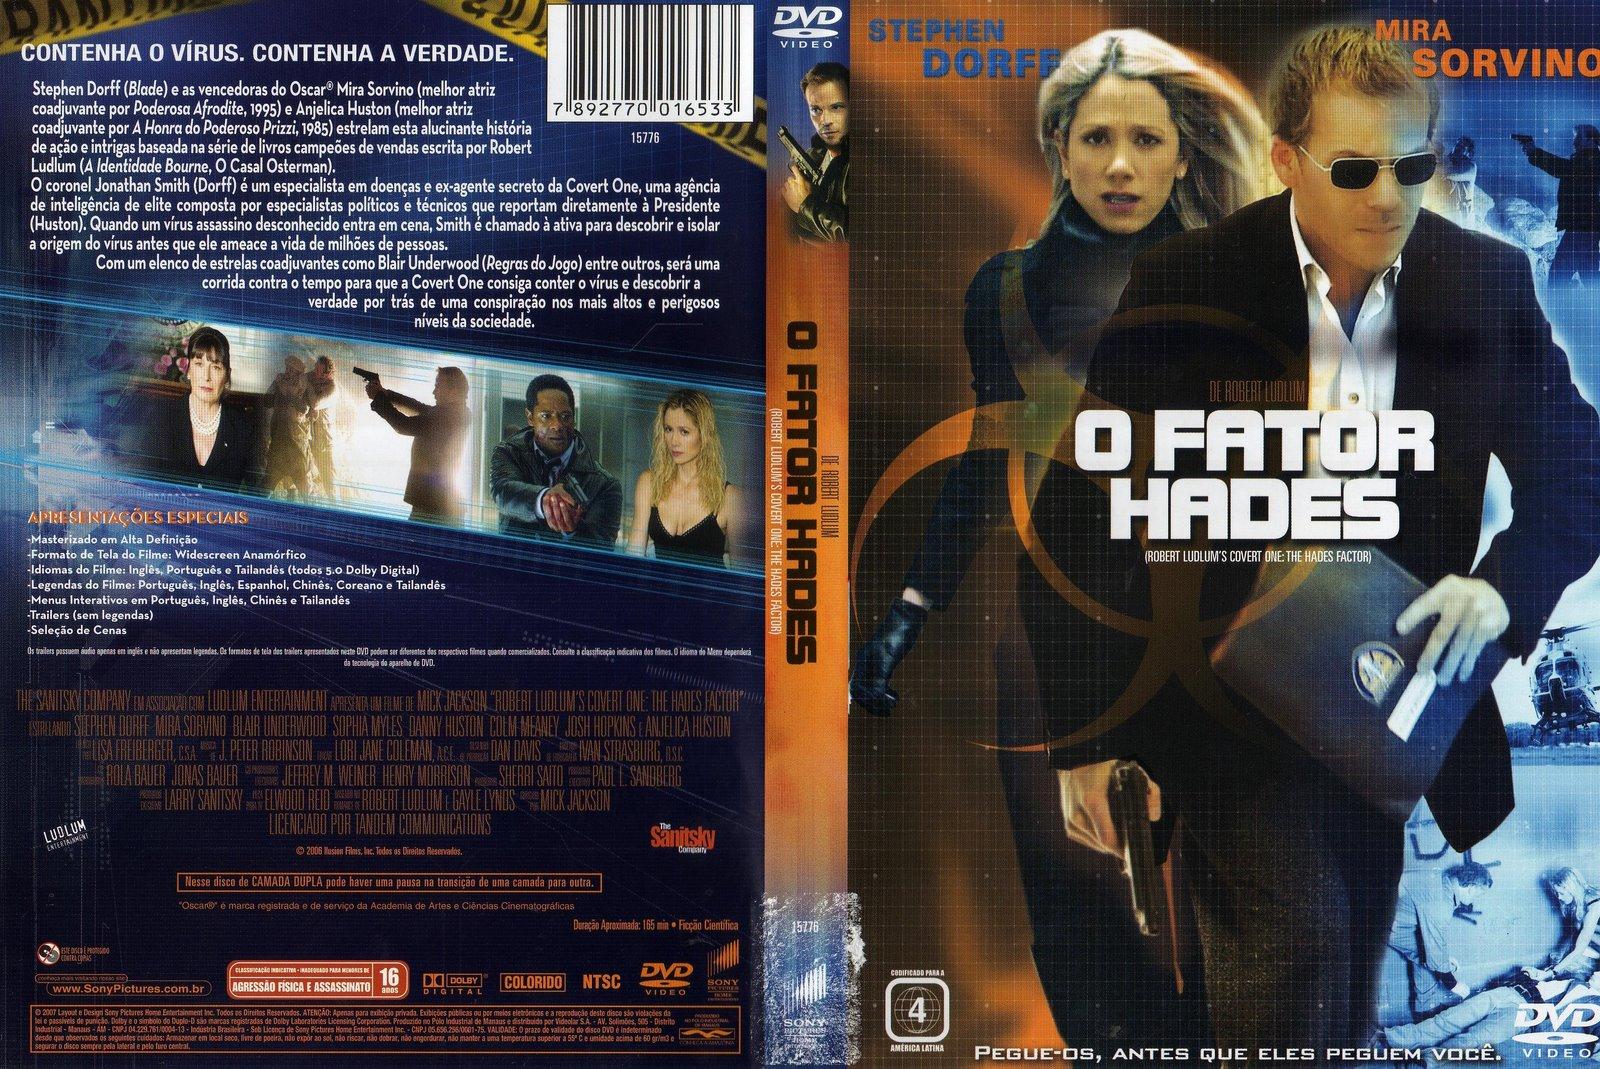 Filme Hades with ise biologia: atividades complementares - filme o fator hades